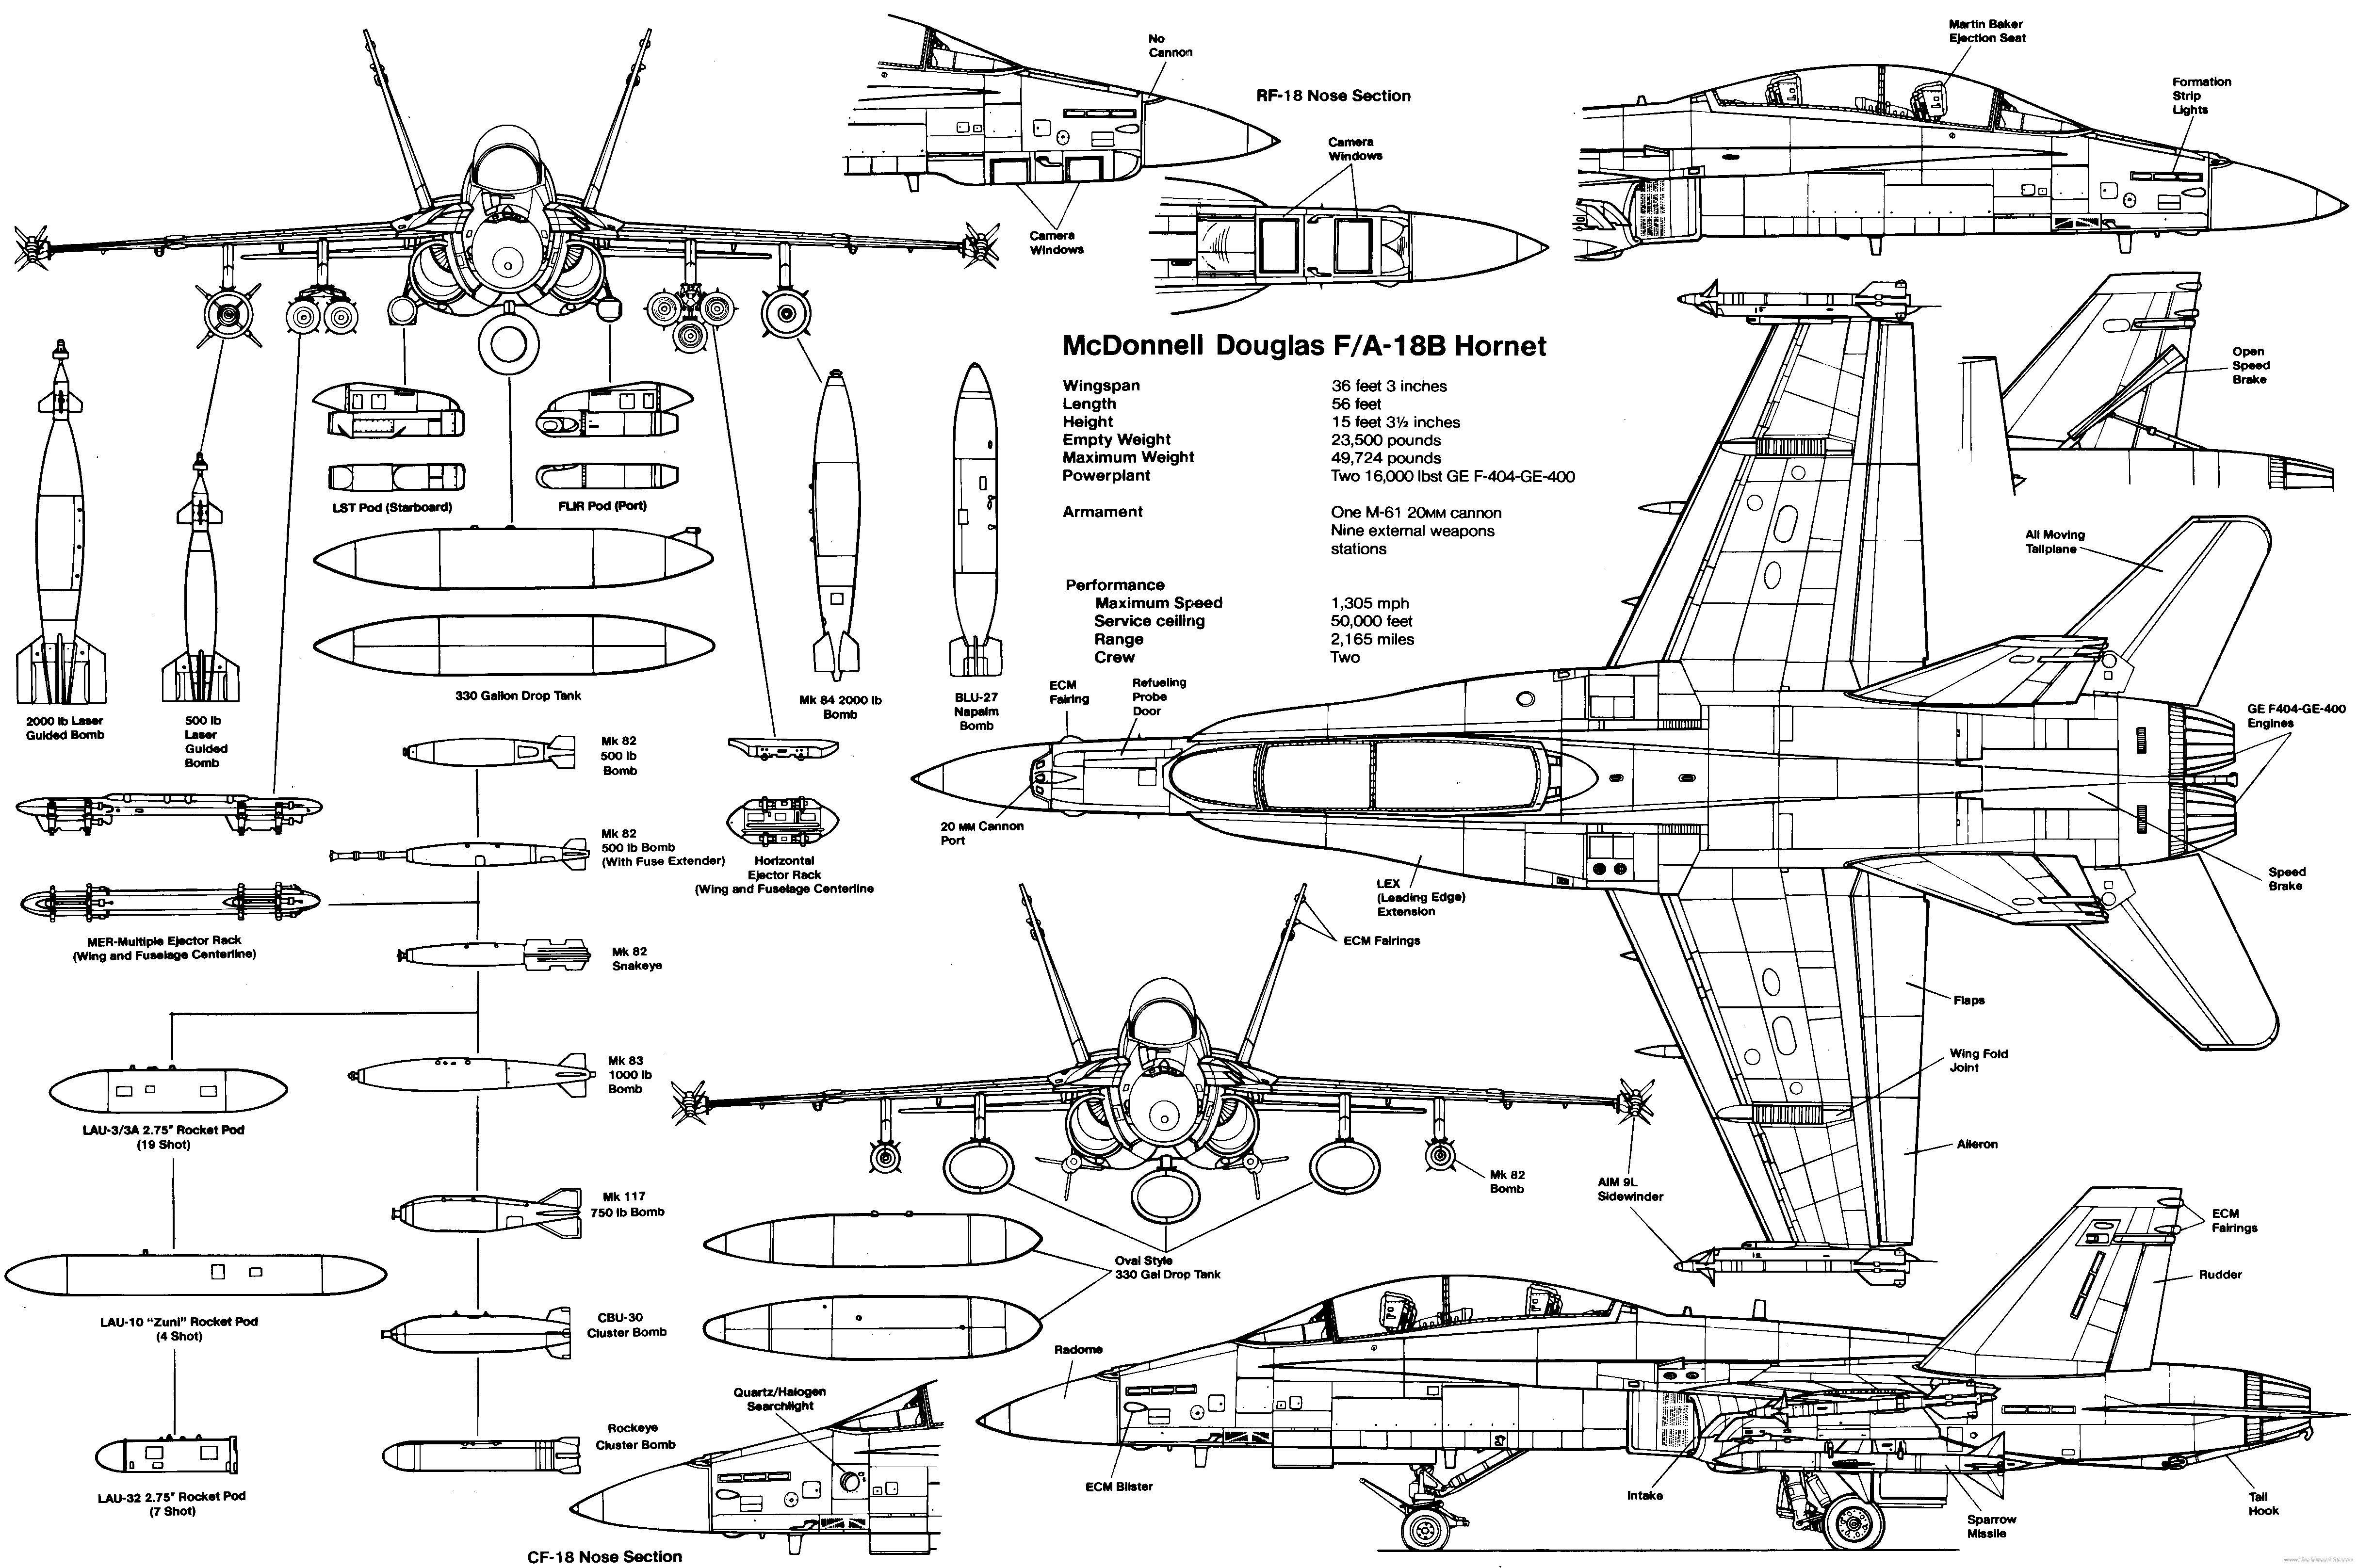 hornet anatomy diagram 2000 chevy blazer ignition wiring of nest best library f 18 fighter jet military plane airplane usa 2 planes aircraft rh pinterest com hornets